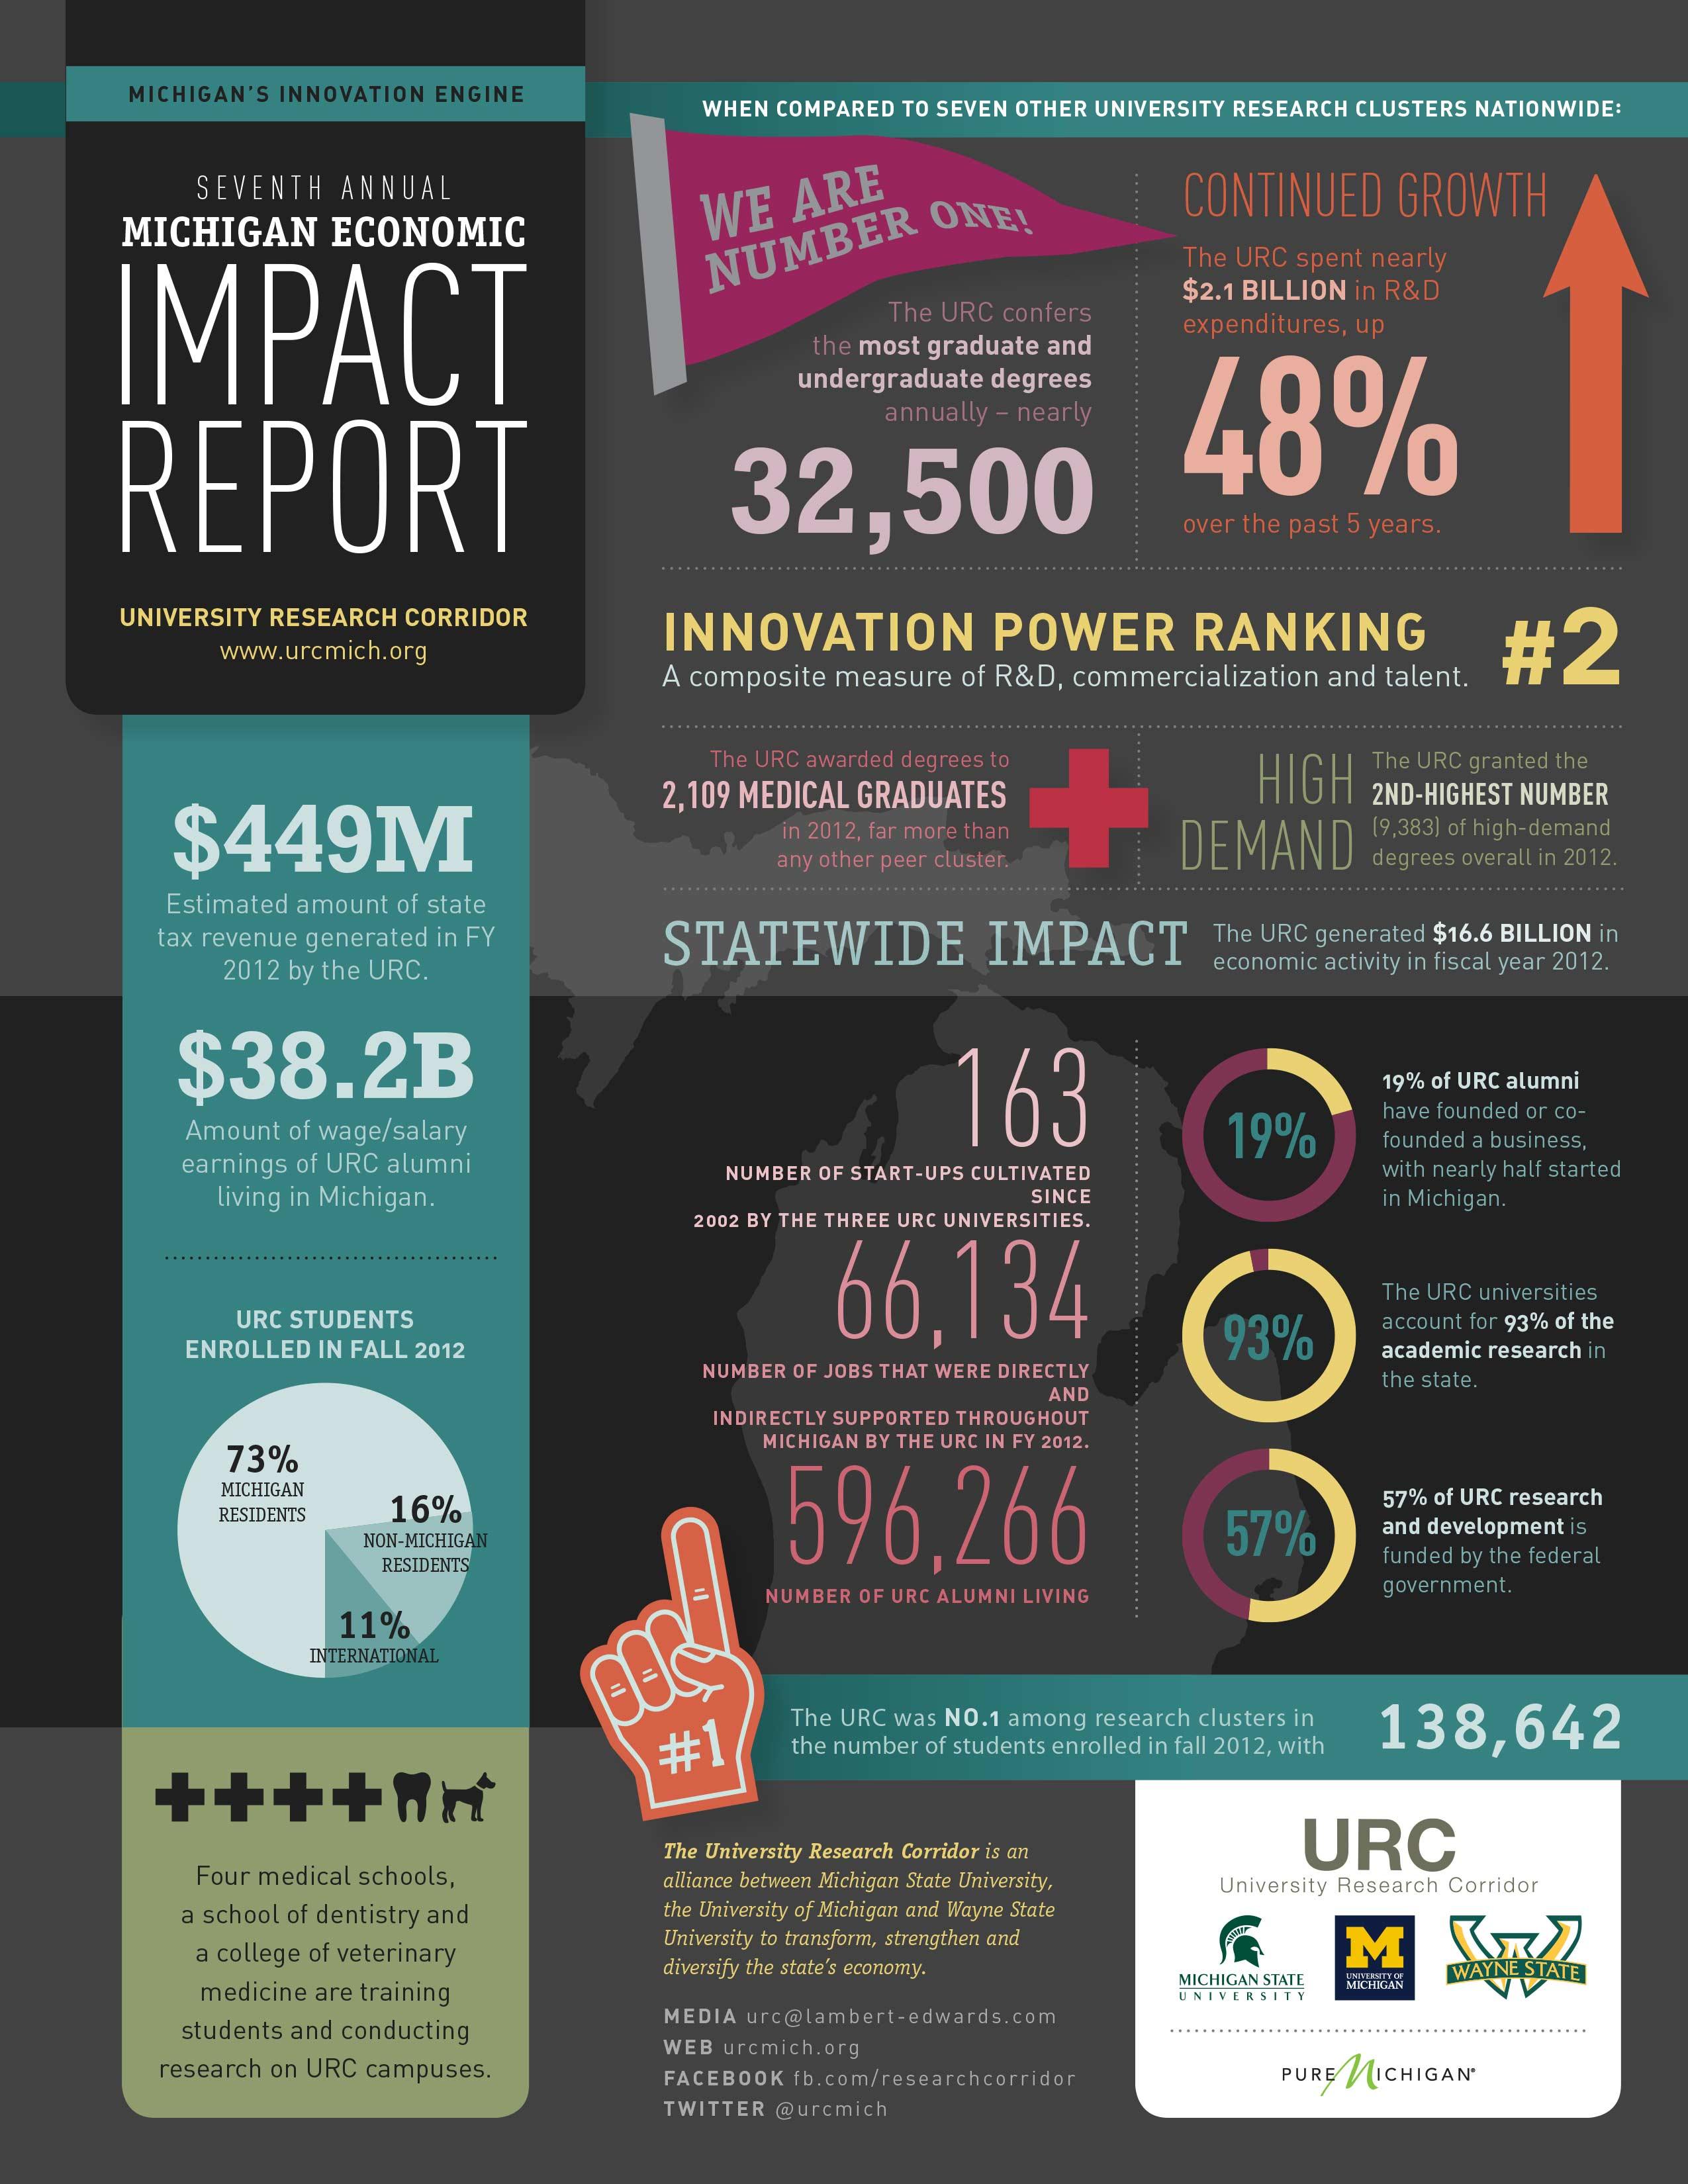 2013 URC Economic Impact informational graphic.